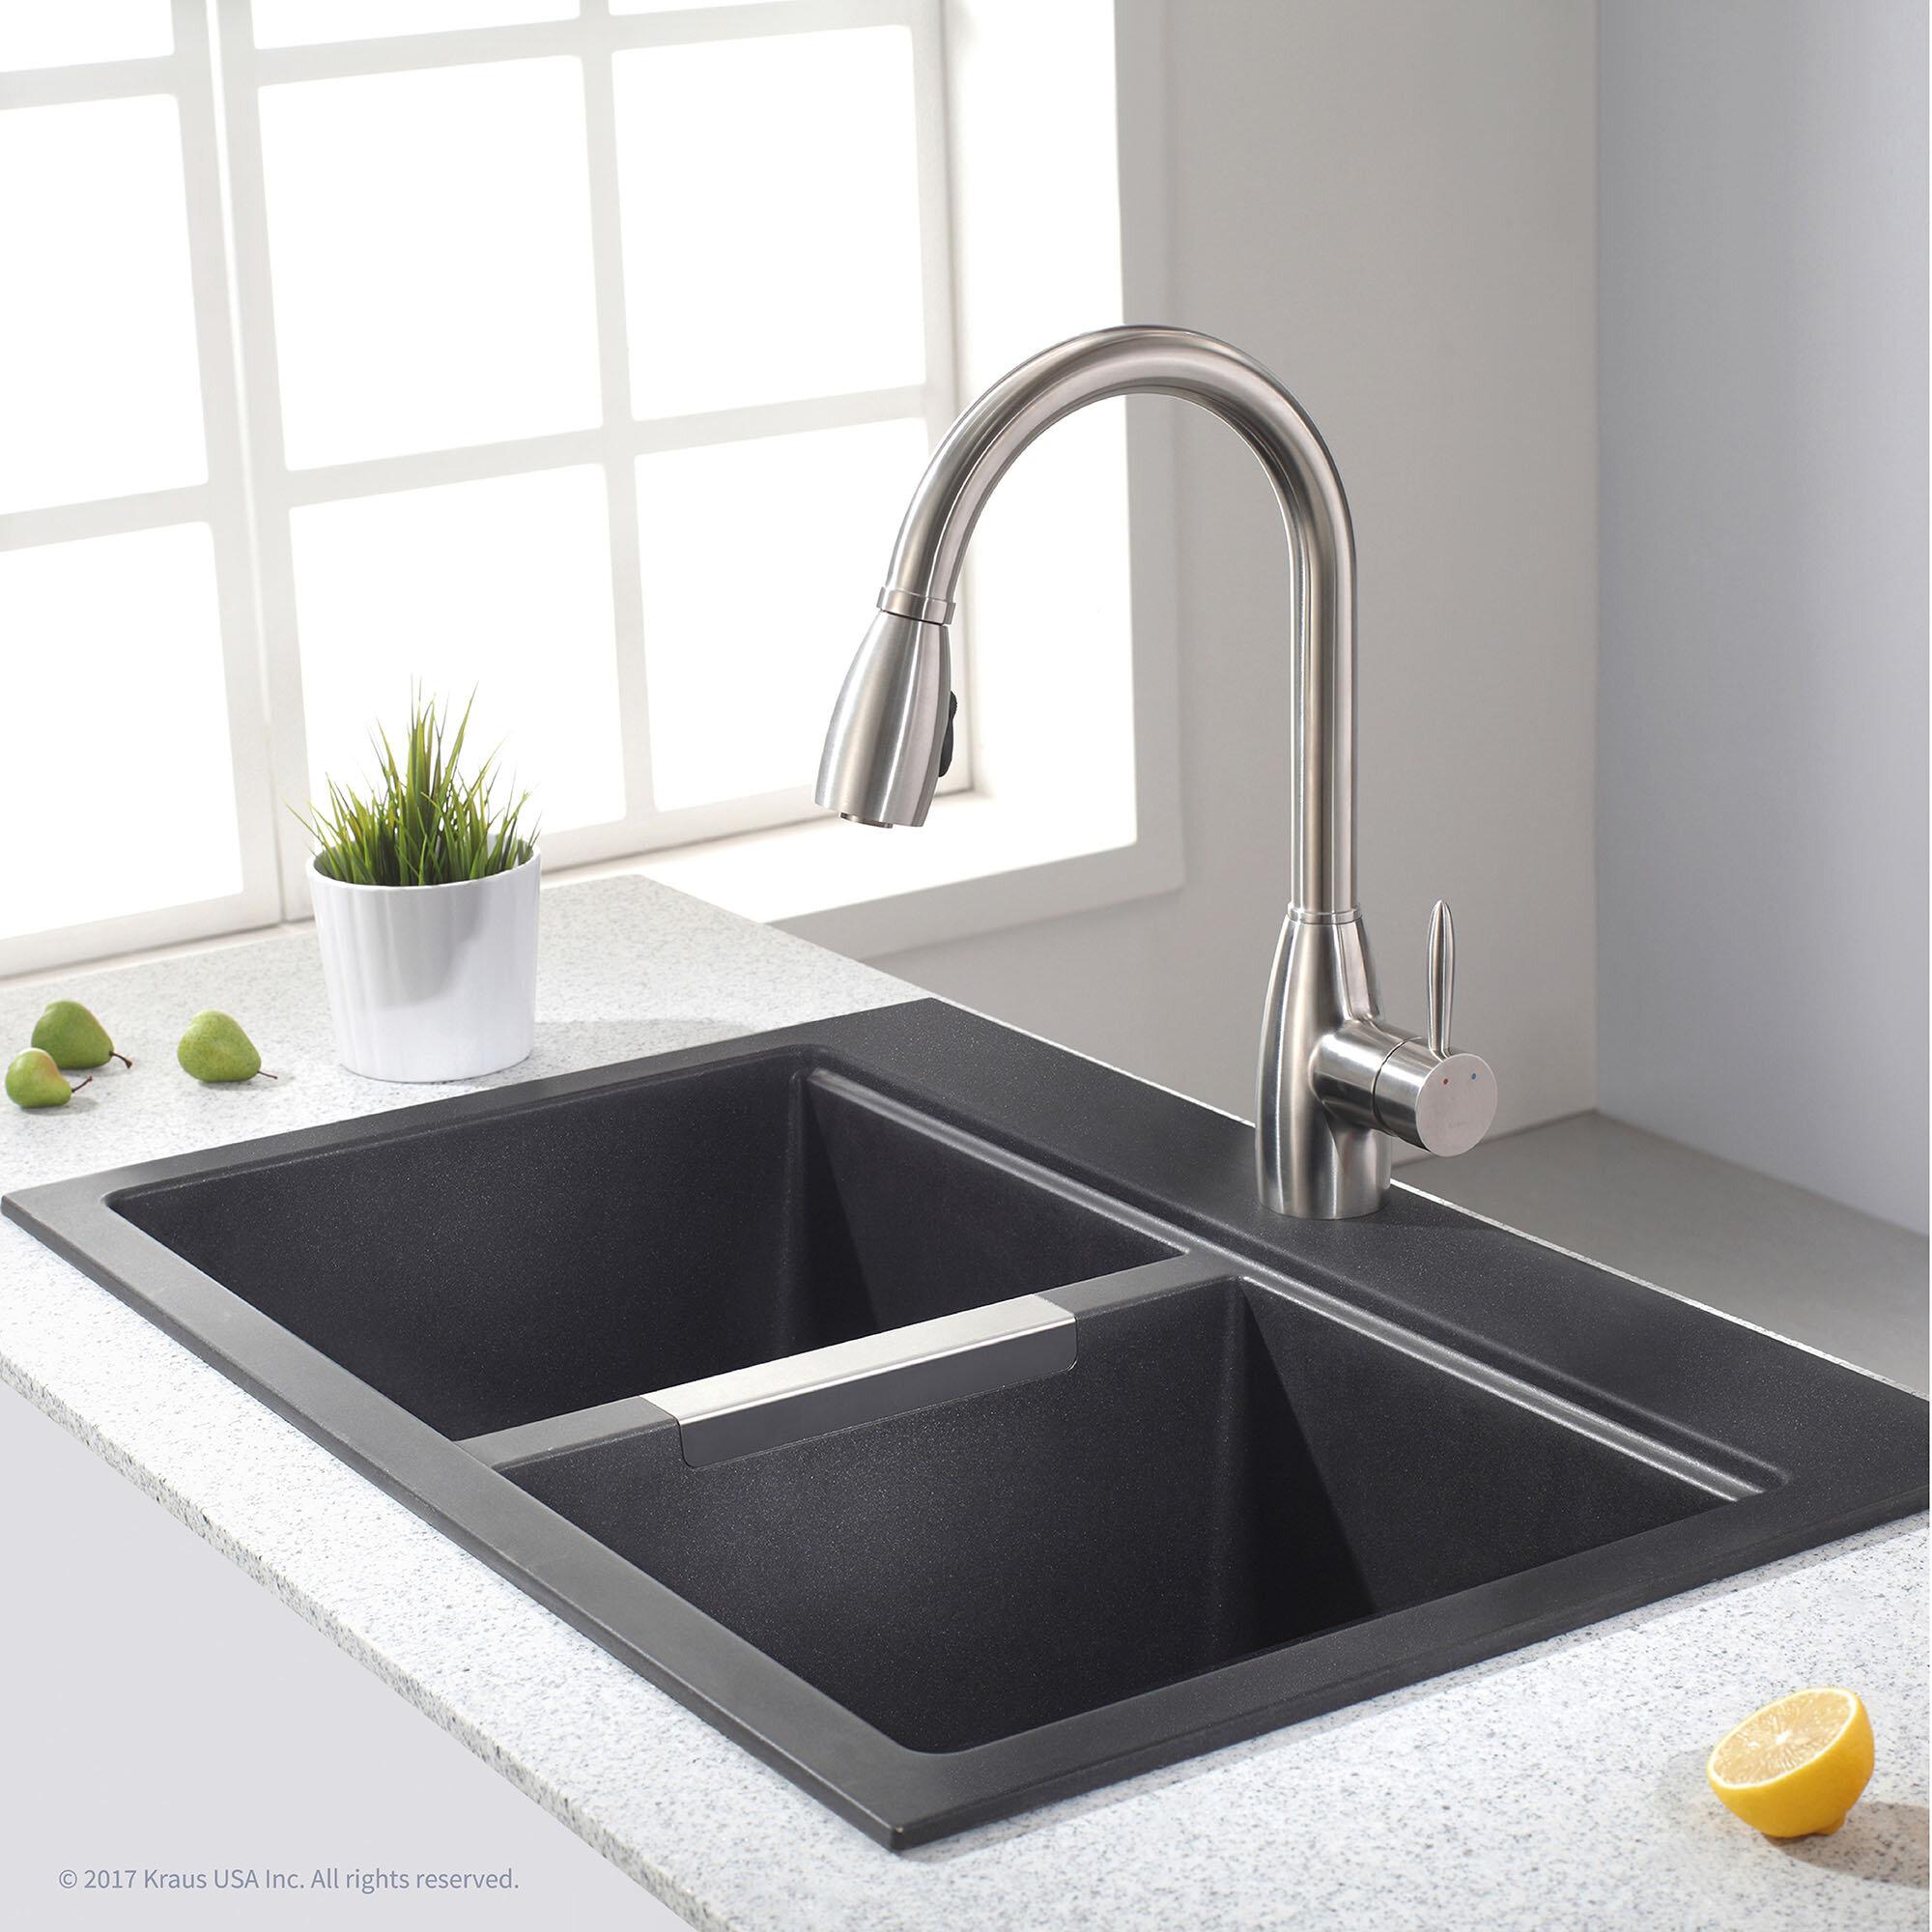 Kraus Granite 33 x 22 Double Basin